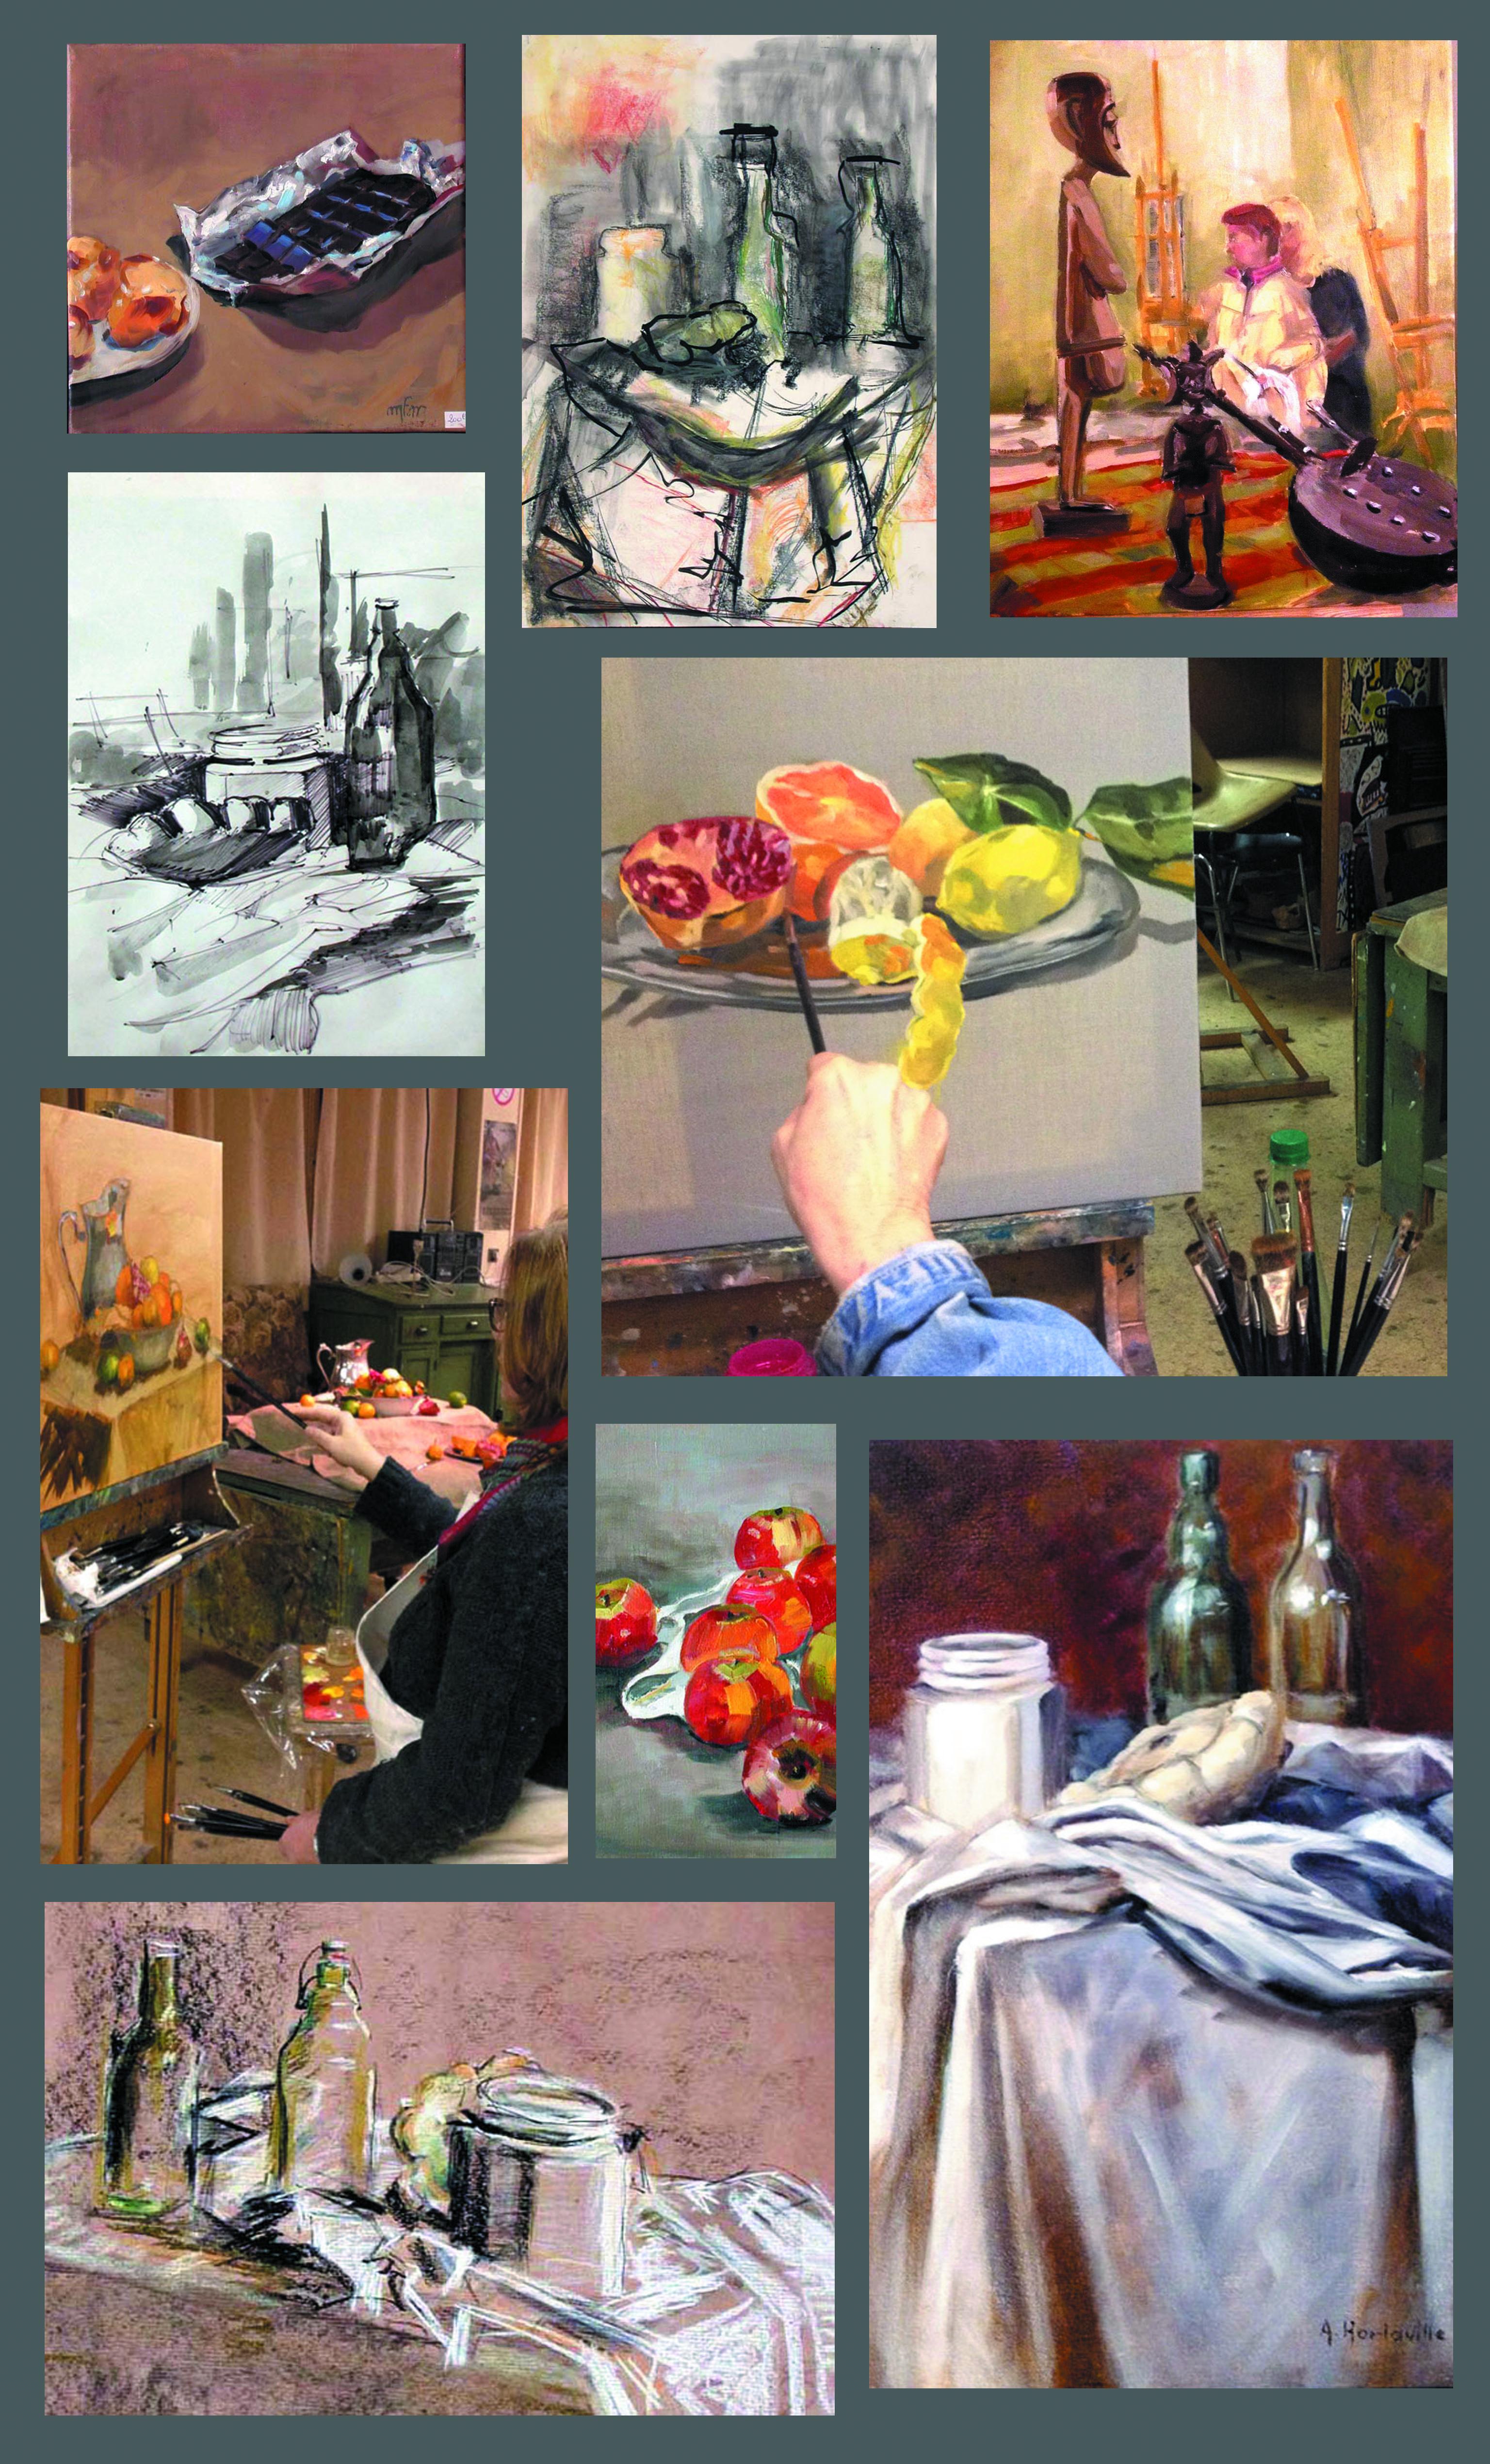 Dessin Peinture Maryse Garel Societe Artistique De Dourdan